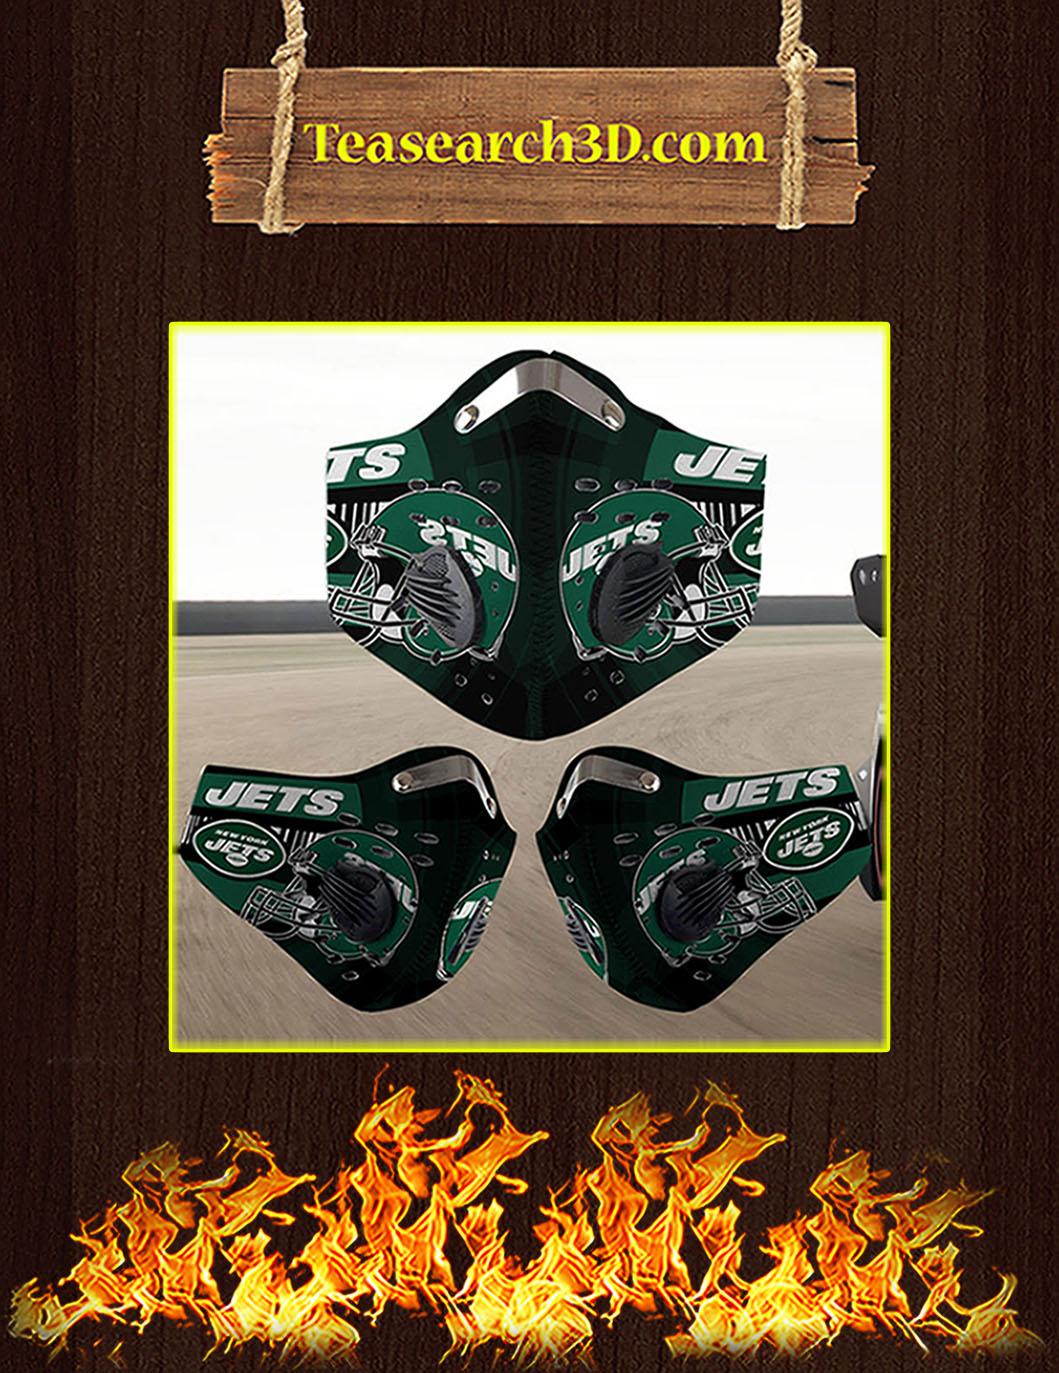 New York Jets filter face mask pack 5